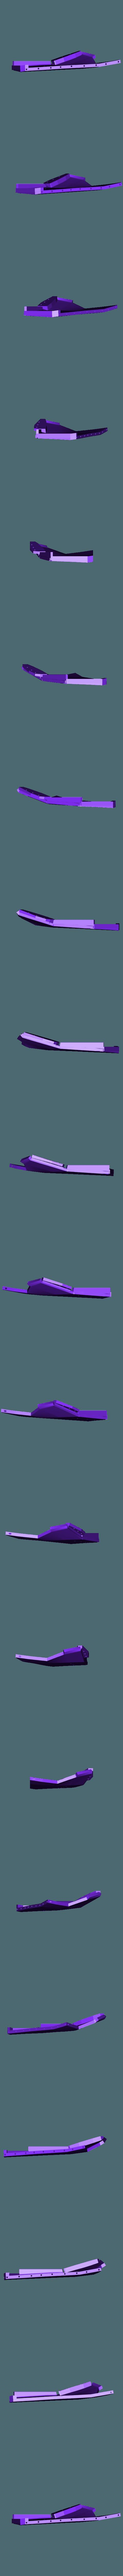 Right side 1.stl Download STL file Iron Man Mark 42  • 3D printing object, SKUPERDIY